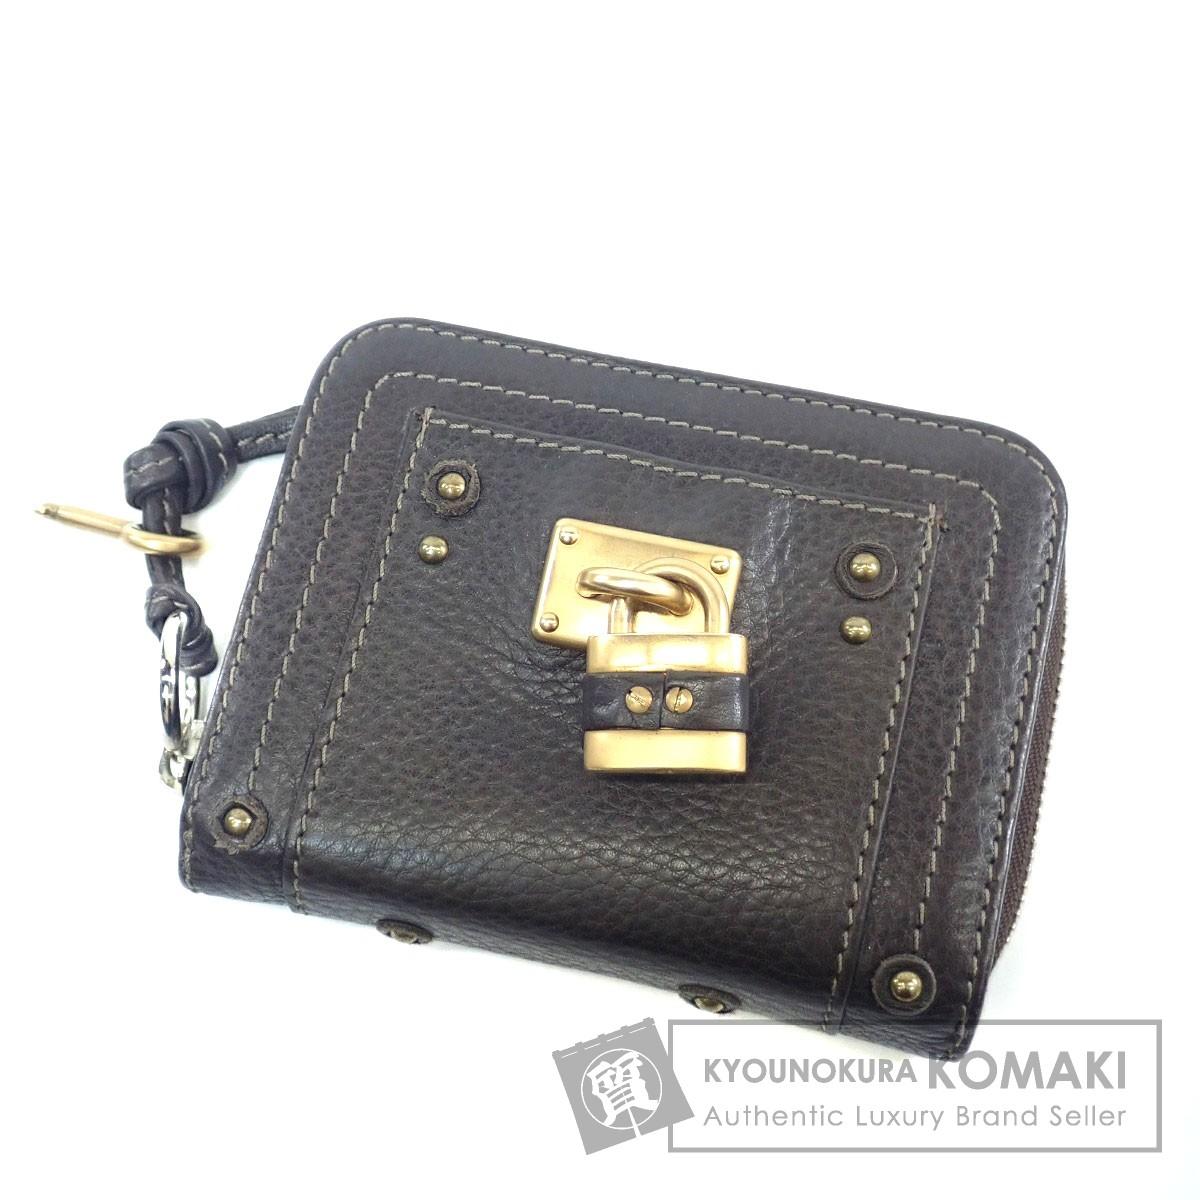 CHLOE カデナモチーフ 二つ折り財布(小銭入れあり) カーフ レディース 【中古】【クロエ】